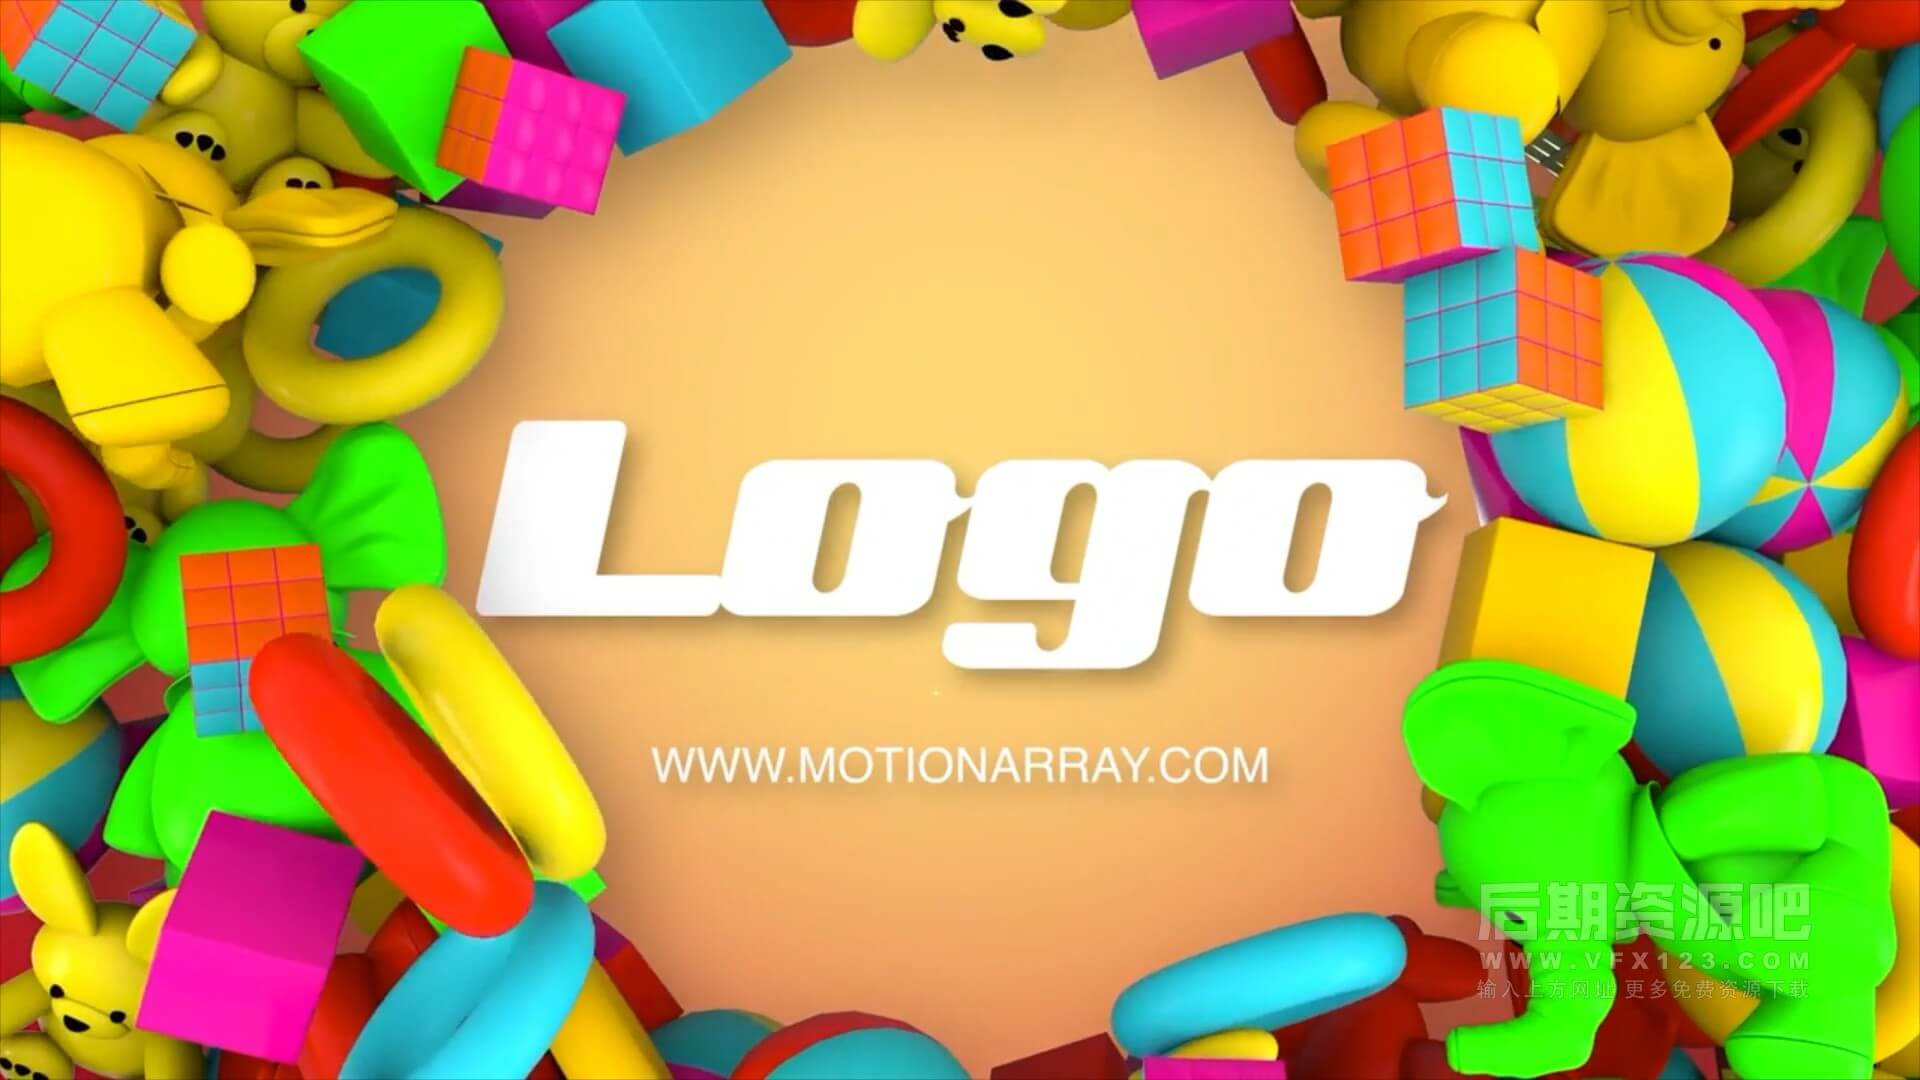 fcpx主题模板 玩具动画幼儿园开学季片头 Kids Toys Logo